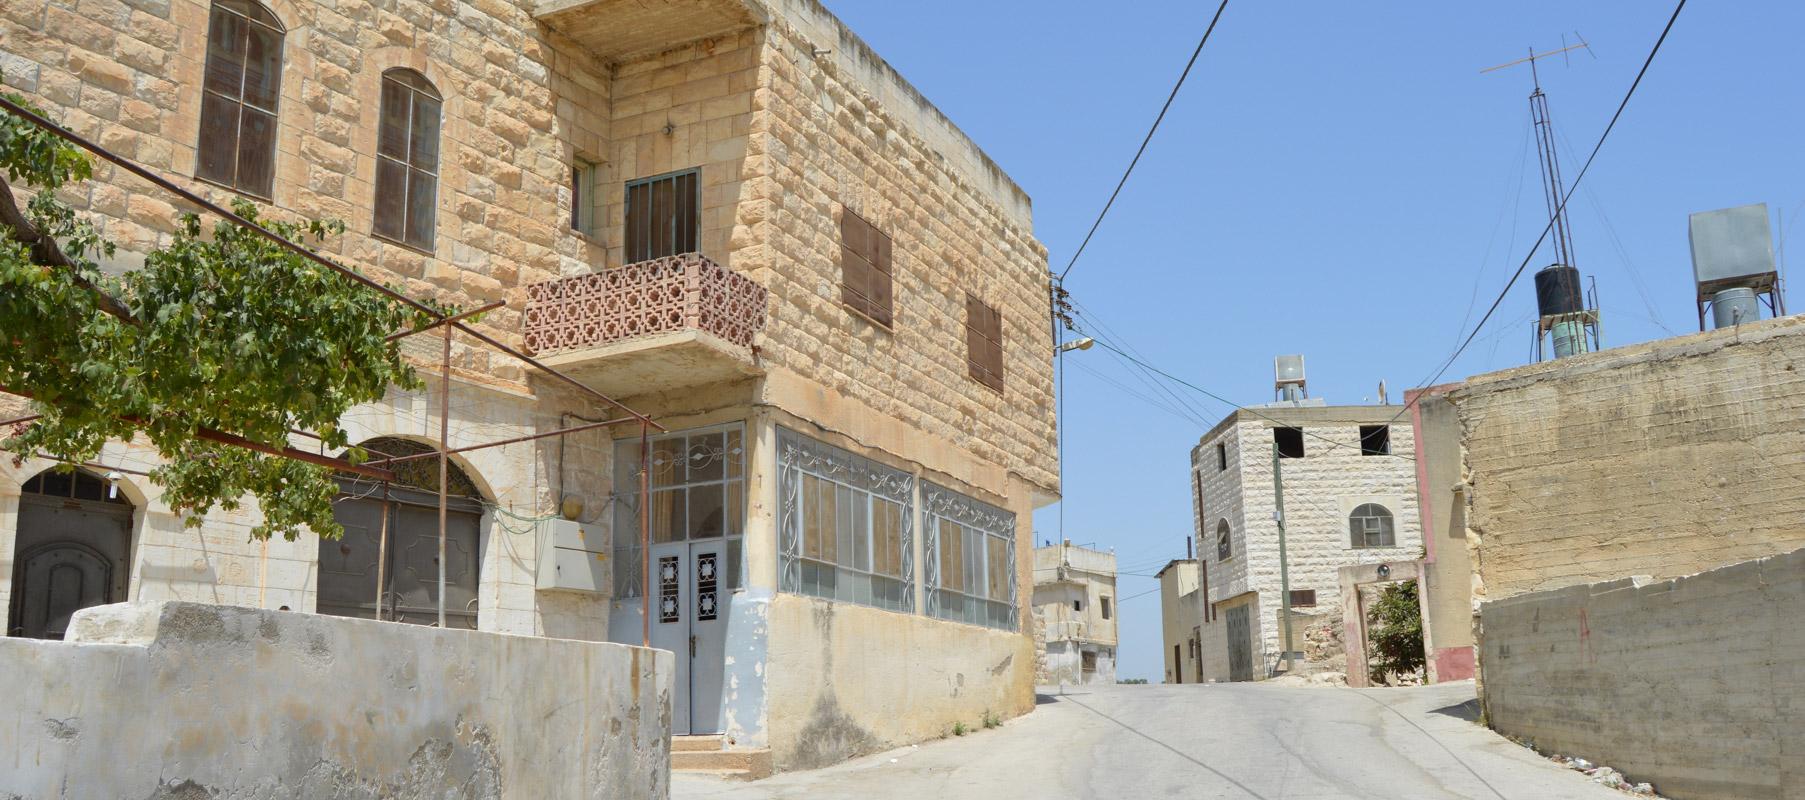 Deir Sharaf, Palestine